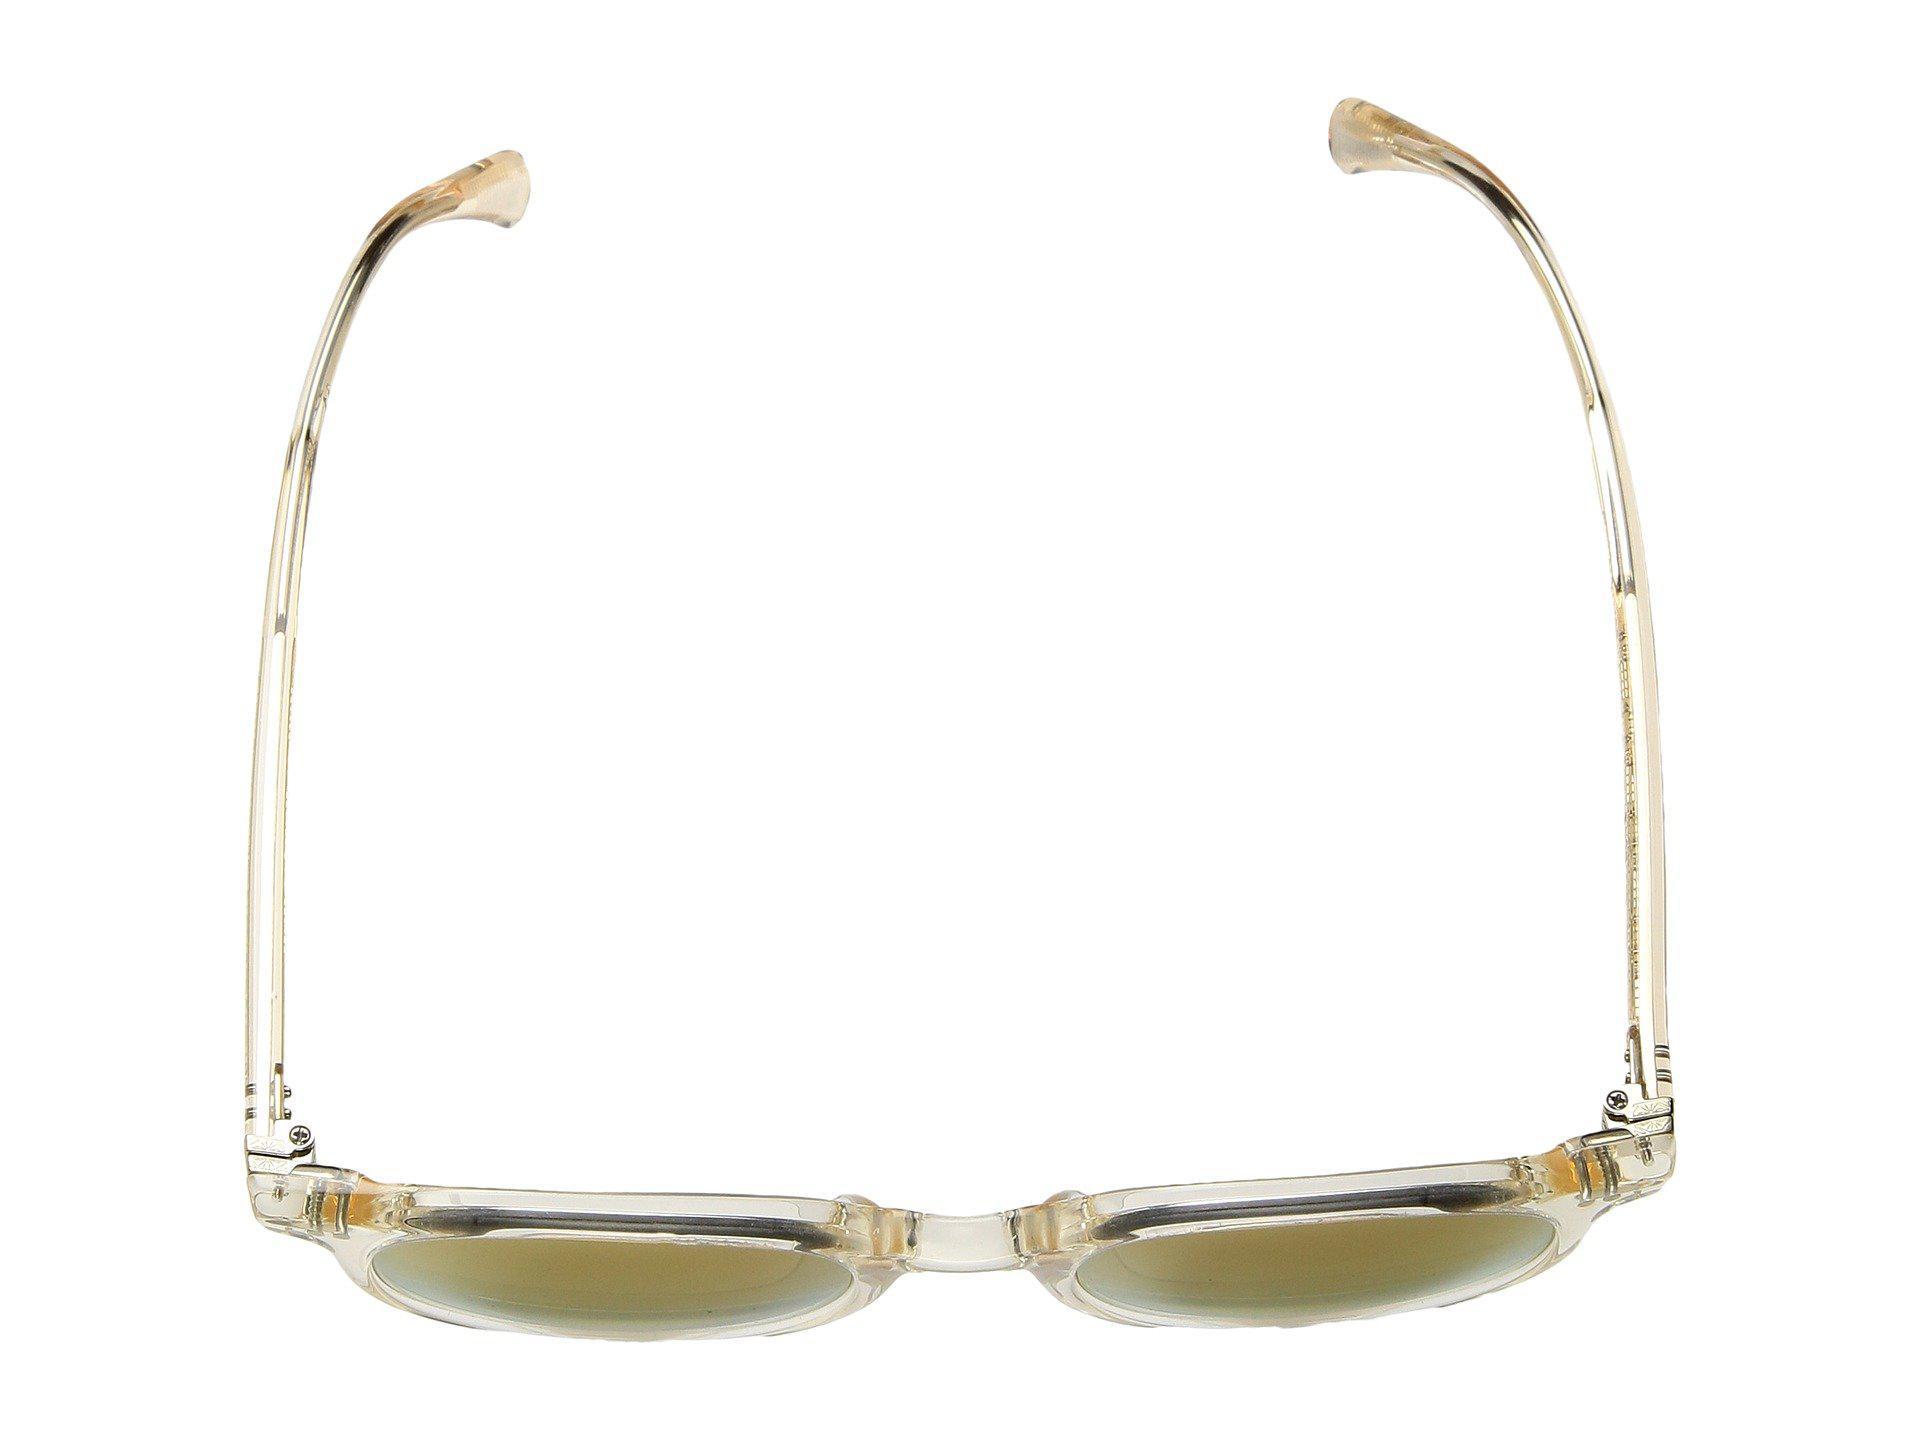 222cce6bcf3 Oliver Peoples - Metallic Delray Sun (buff amber Gold Tone) Fashion  Sunglasses -. View fullscreen